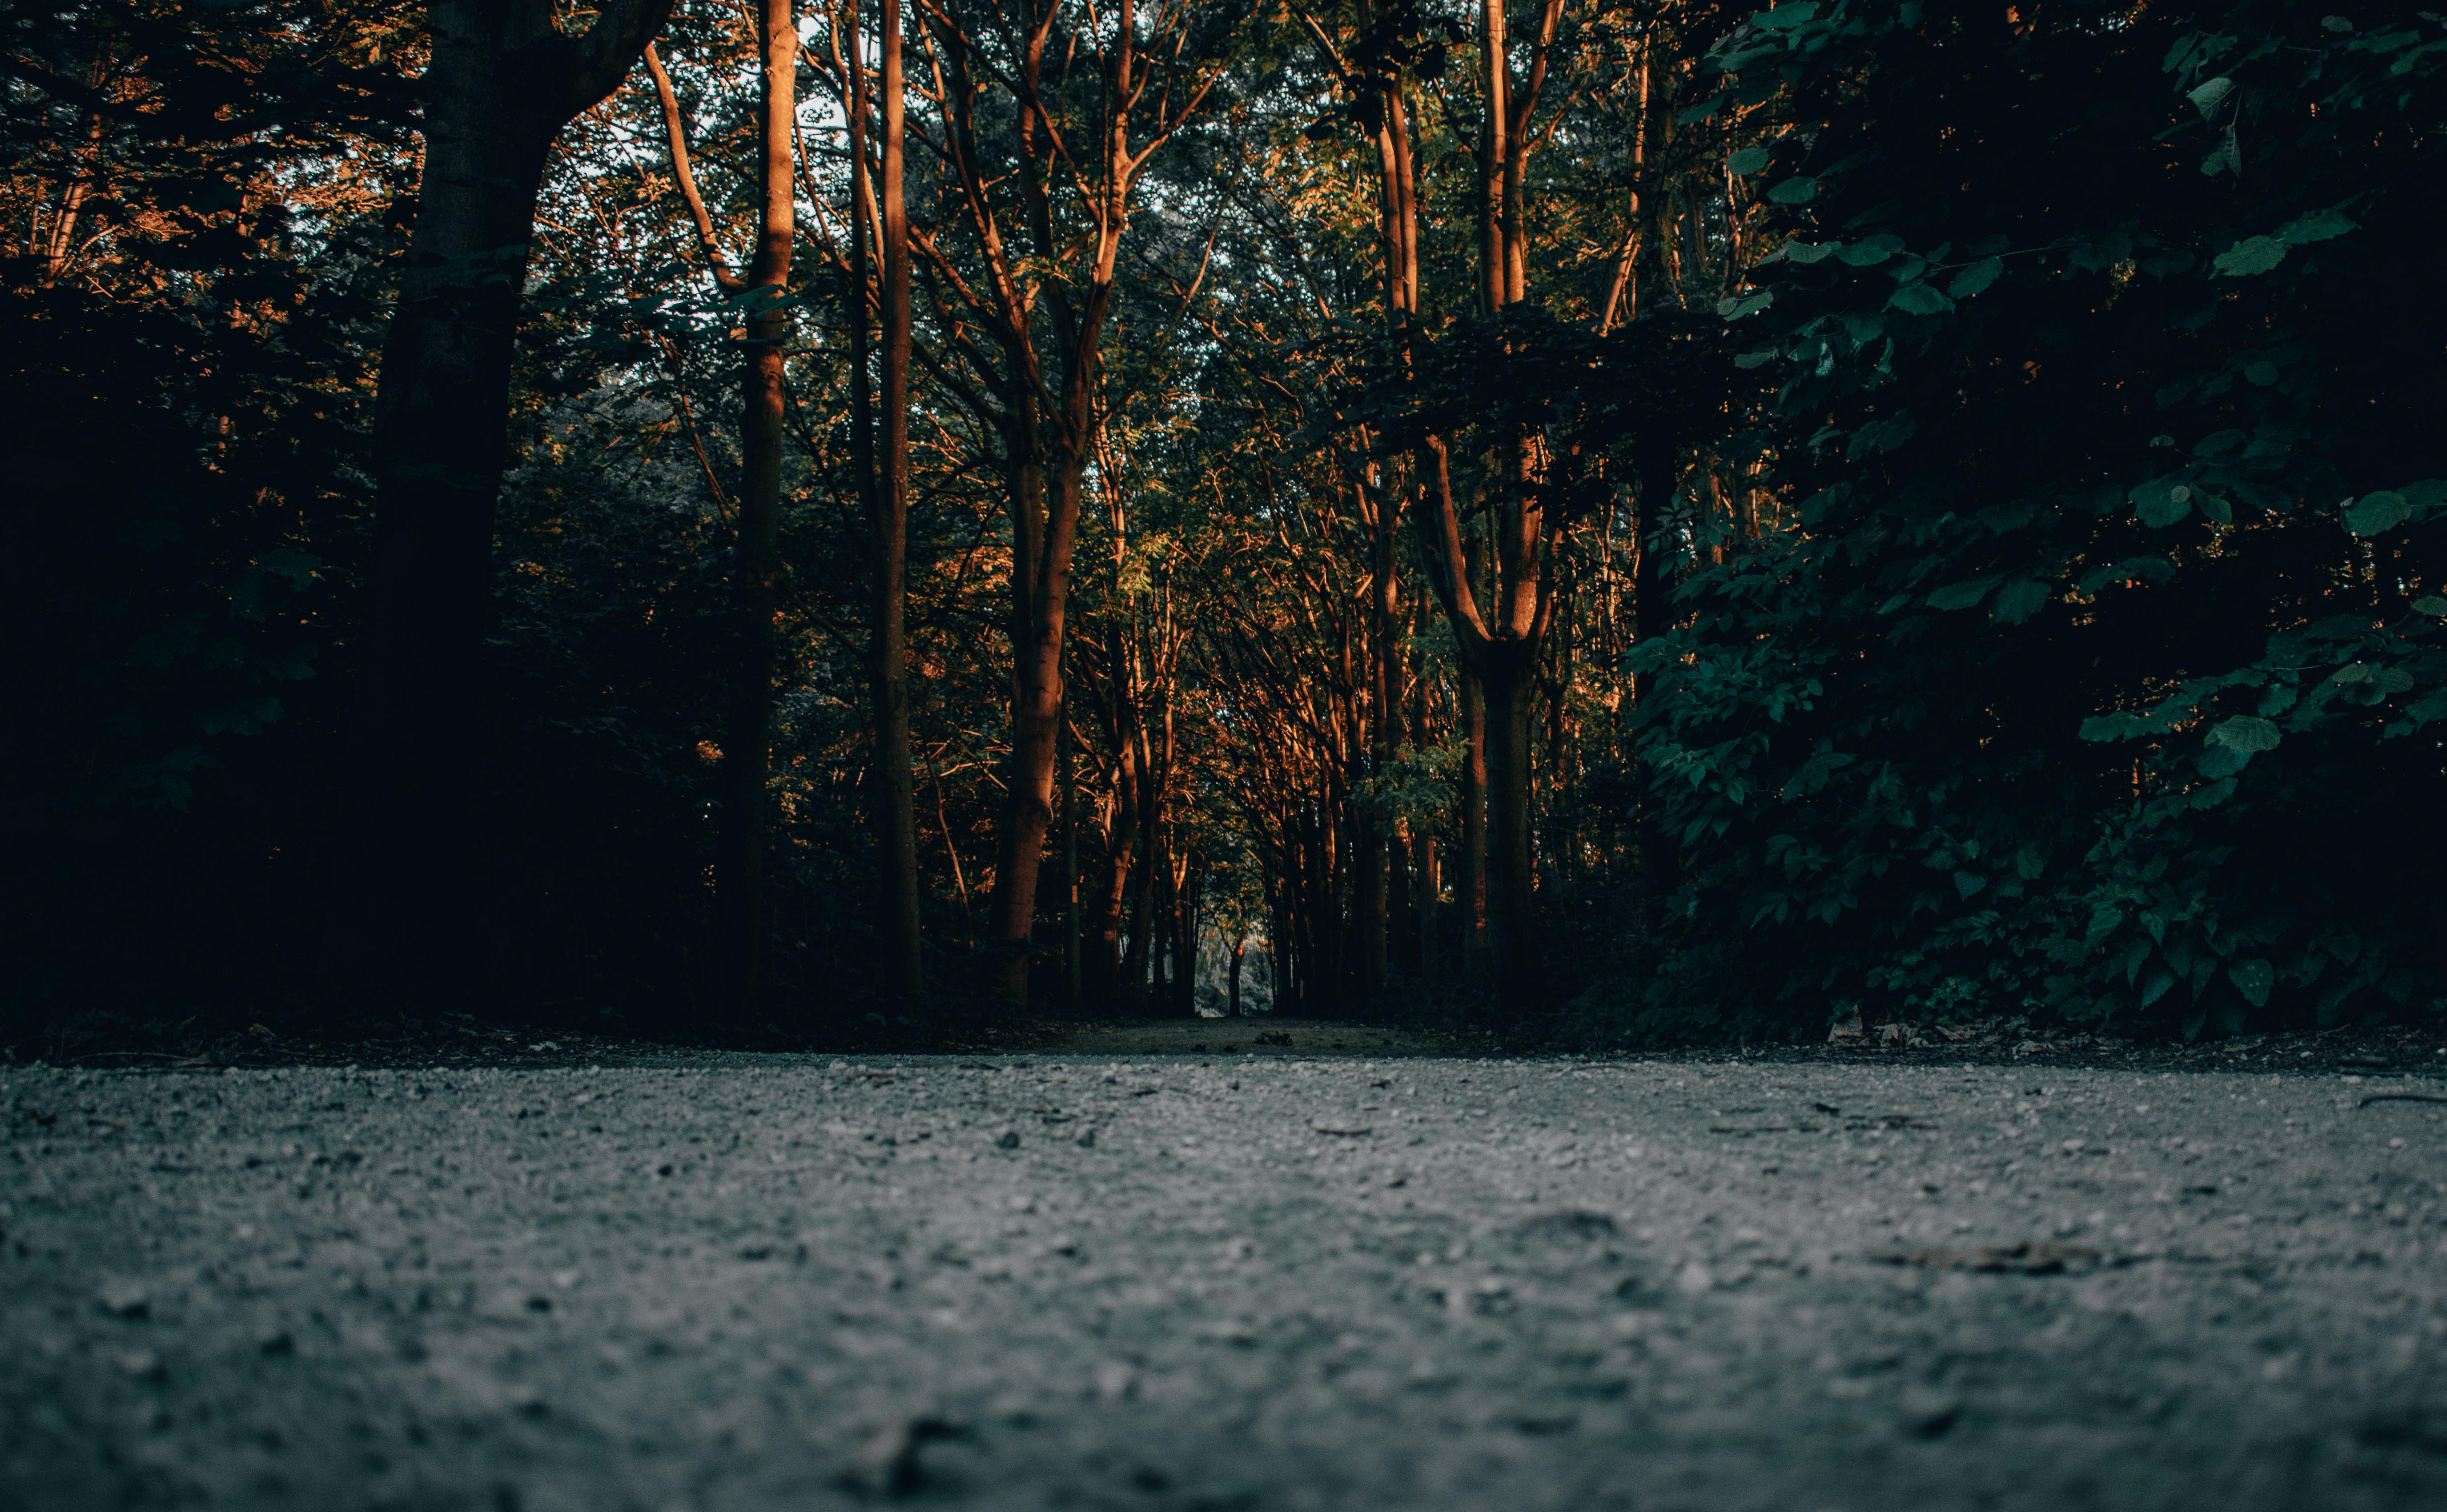 Утро в парке рассвет лес закат дорога дерево